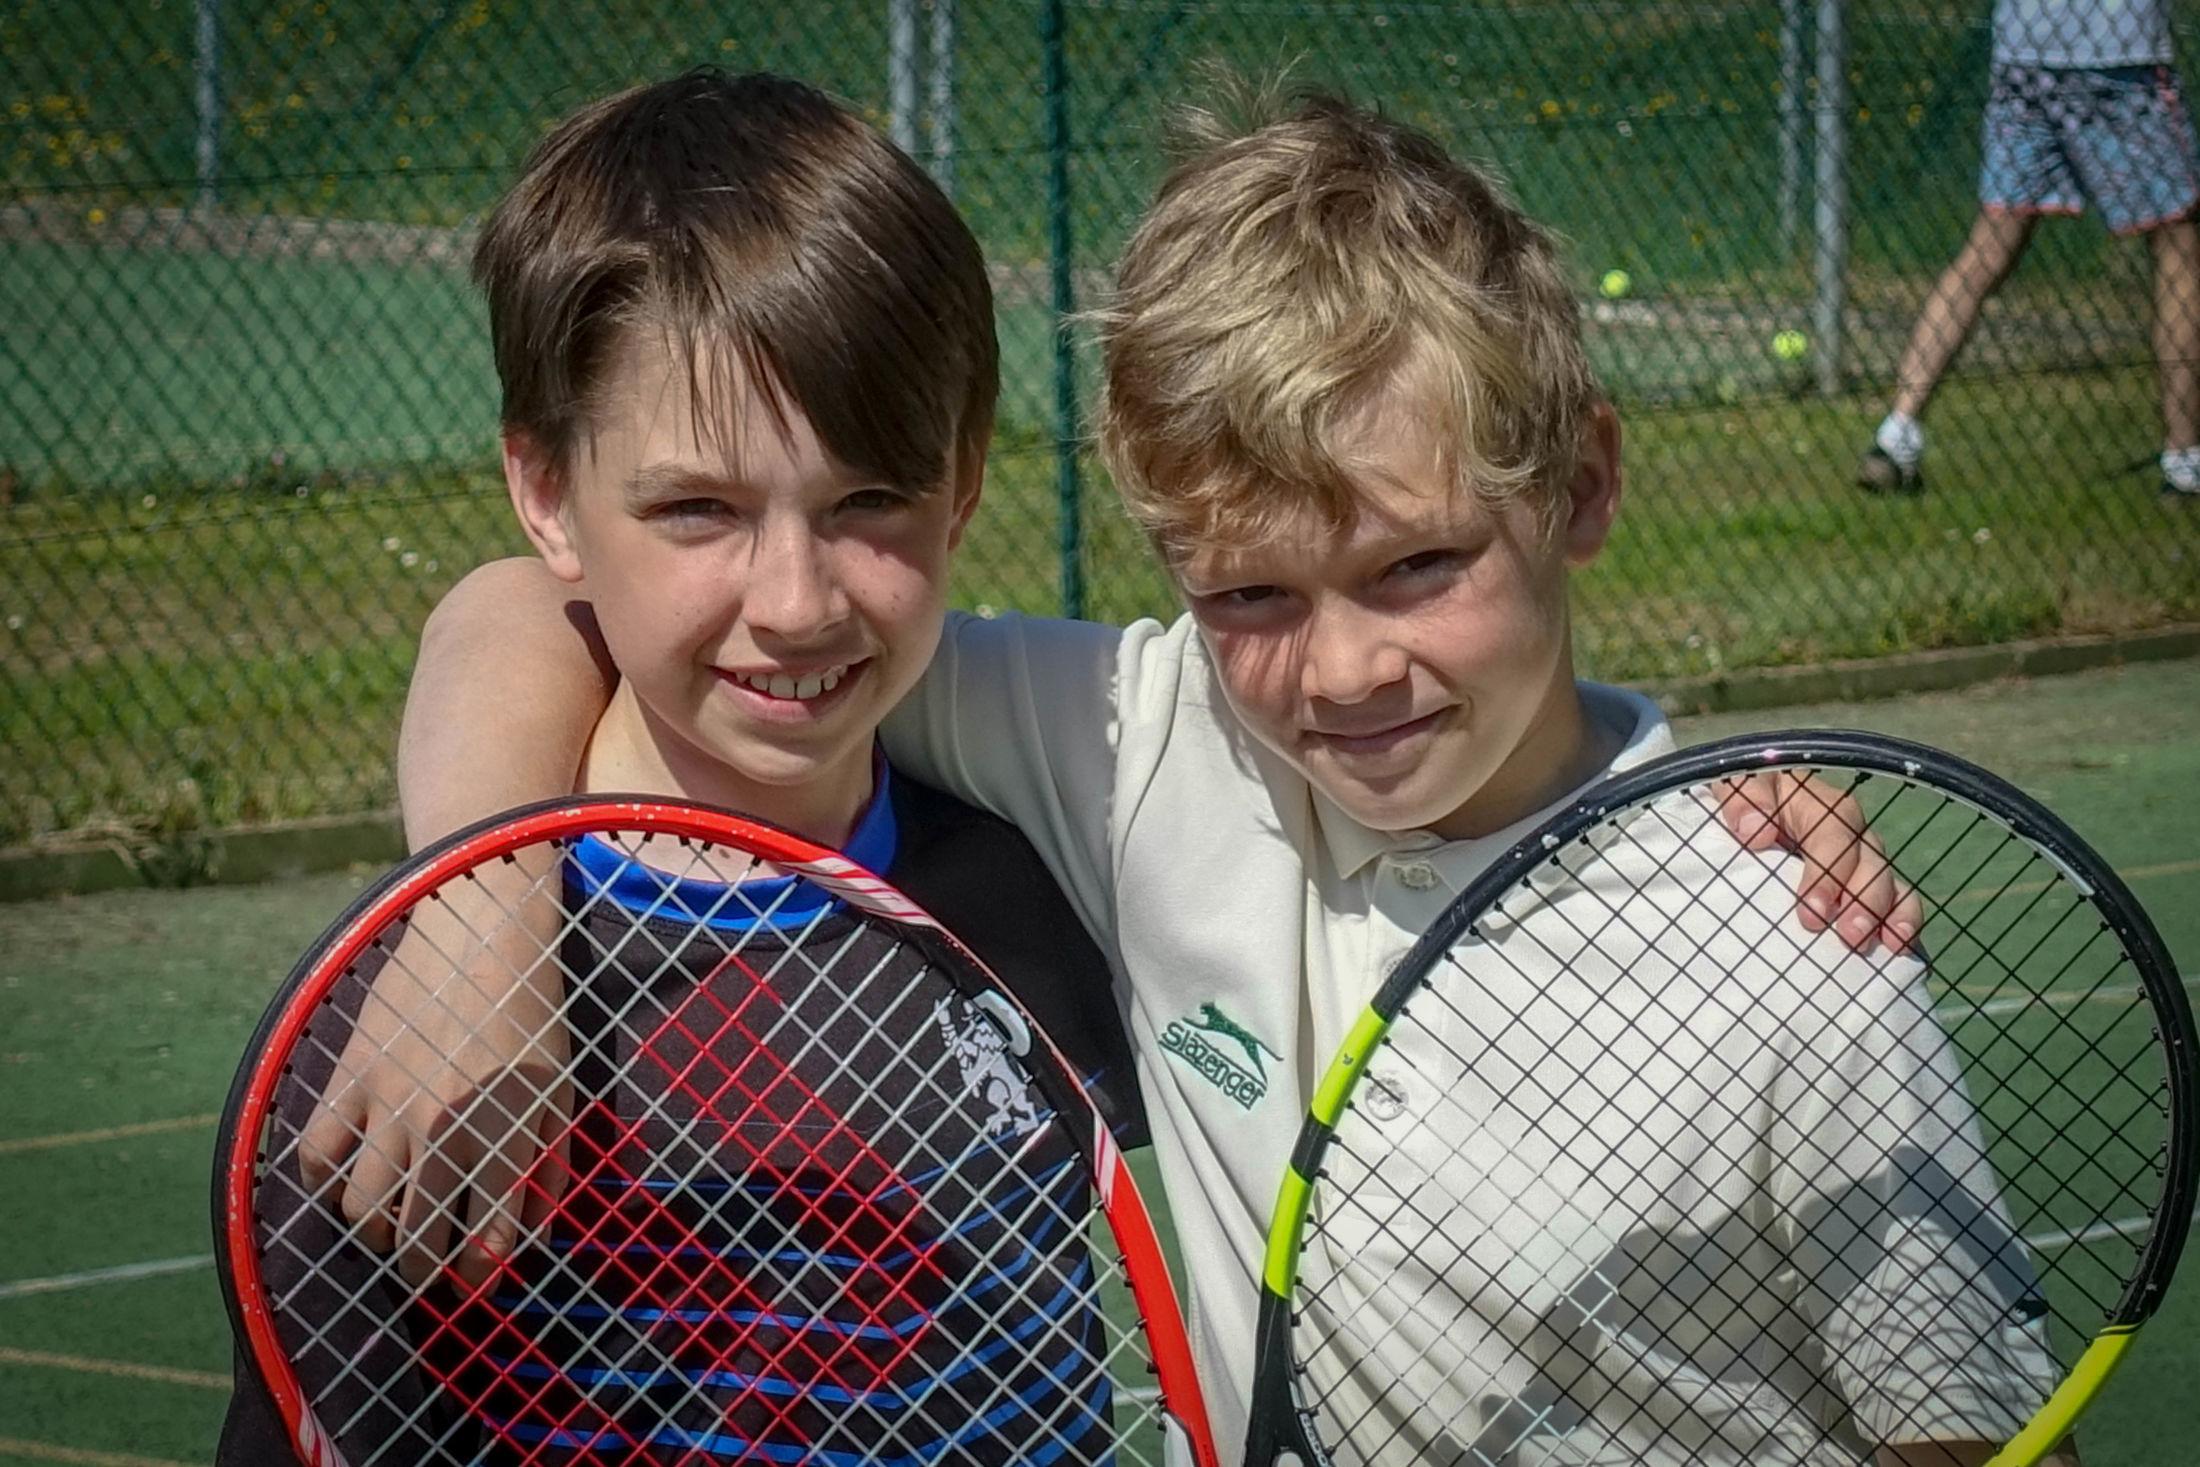 Tennis at St David's College